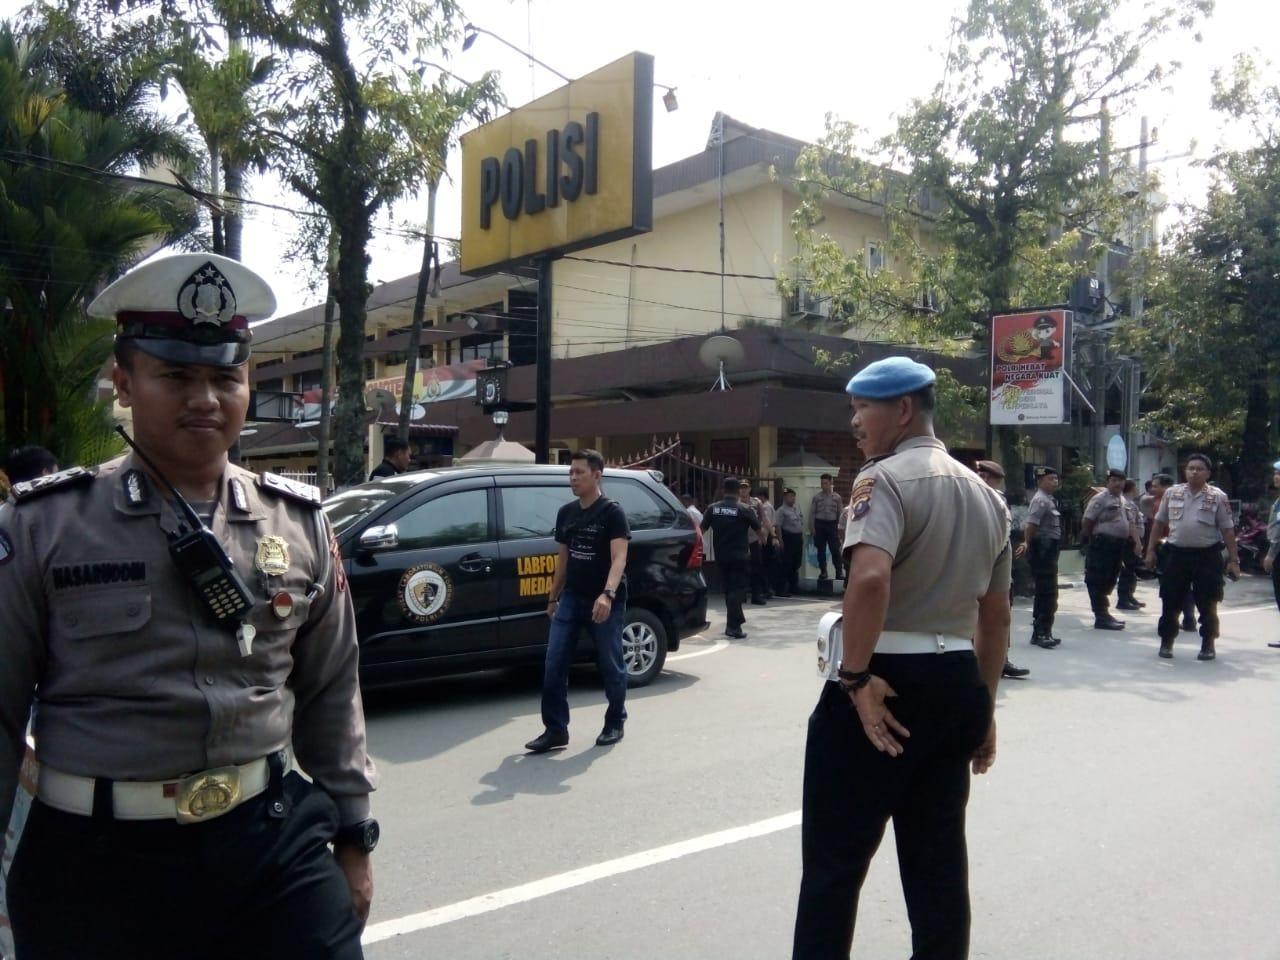 Imades, Ajak Masyarakat Bantu Polisi Lawan Aksi Terorisme